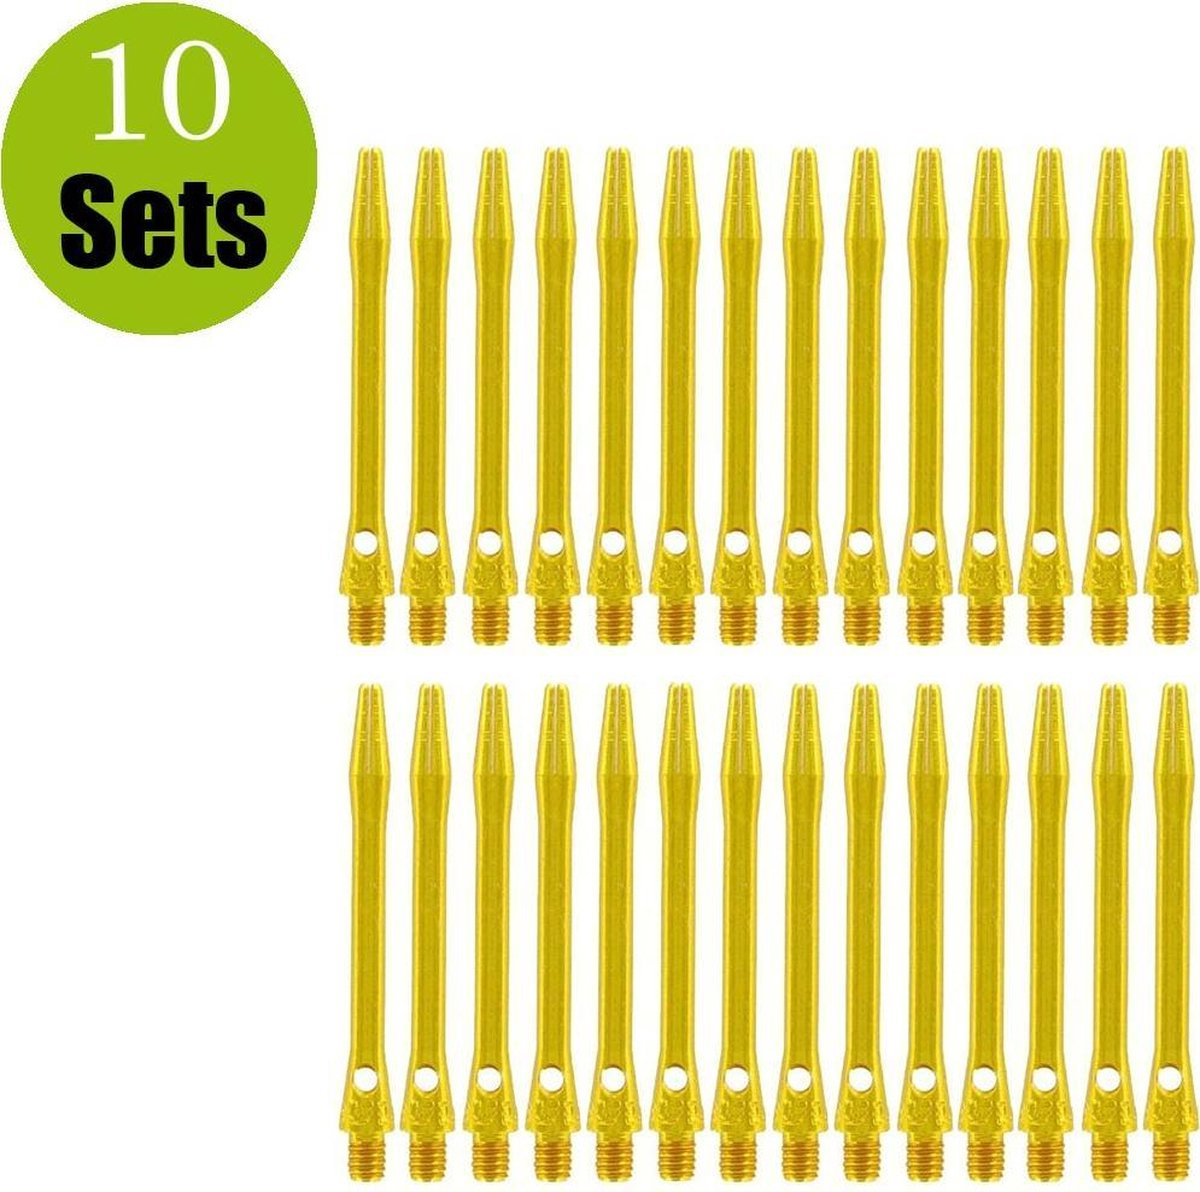 Aluminium Dart Shafts - Goud - Medium - (10 Sets)